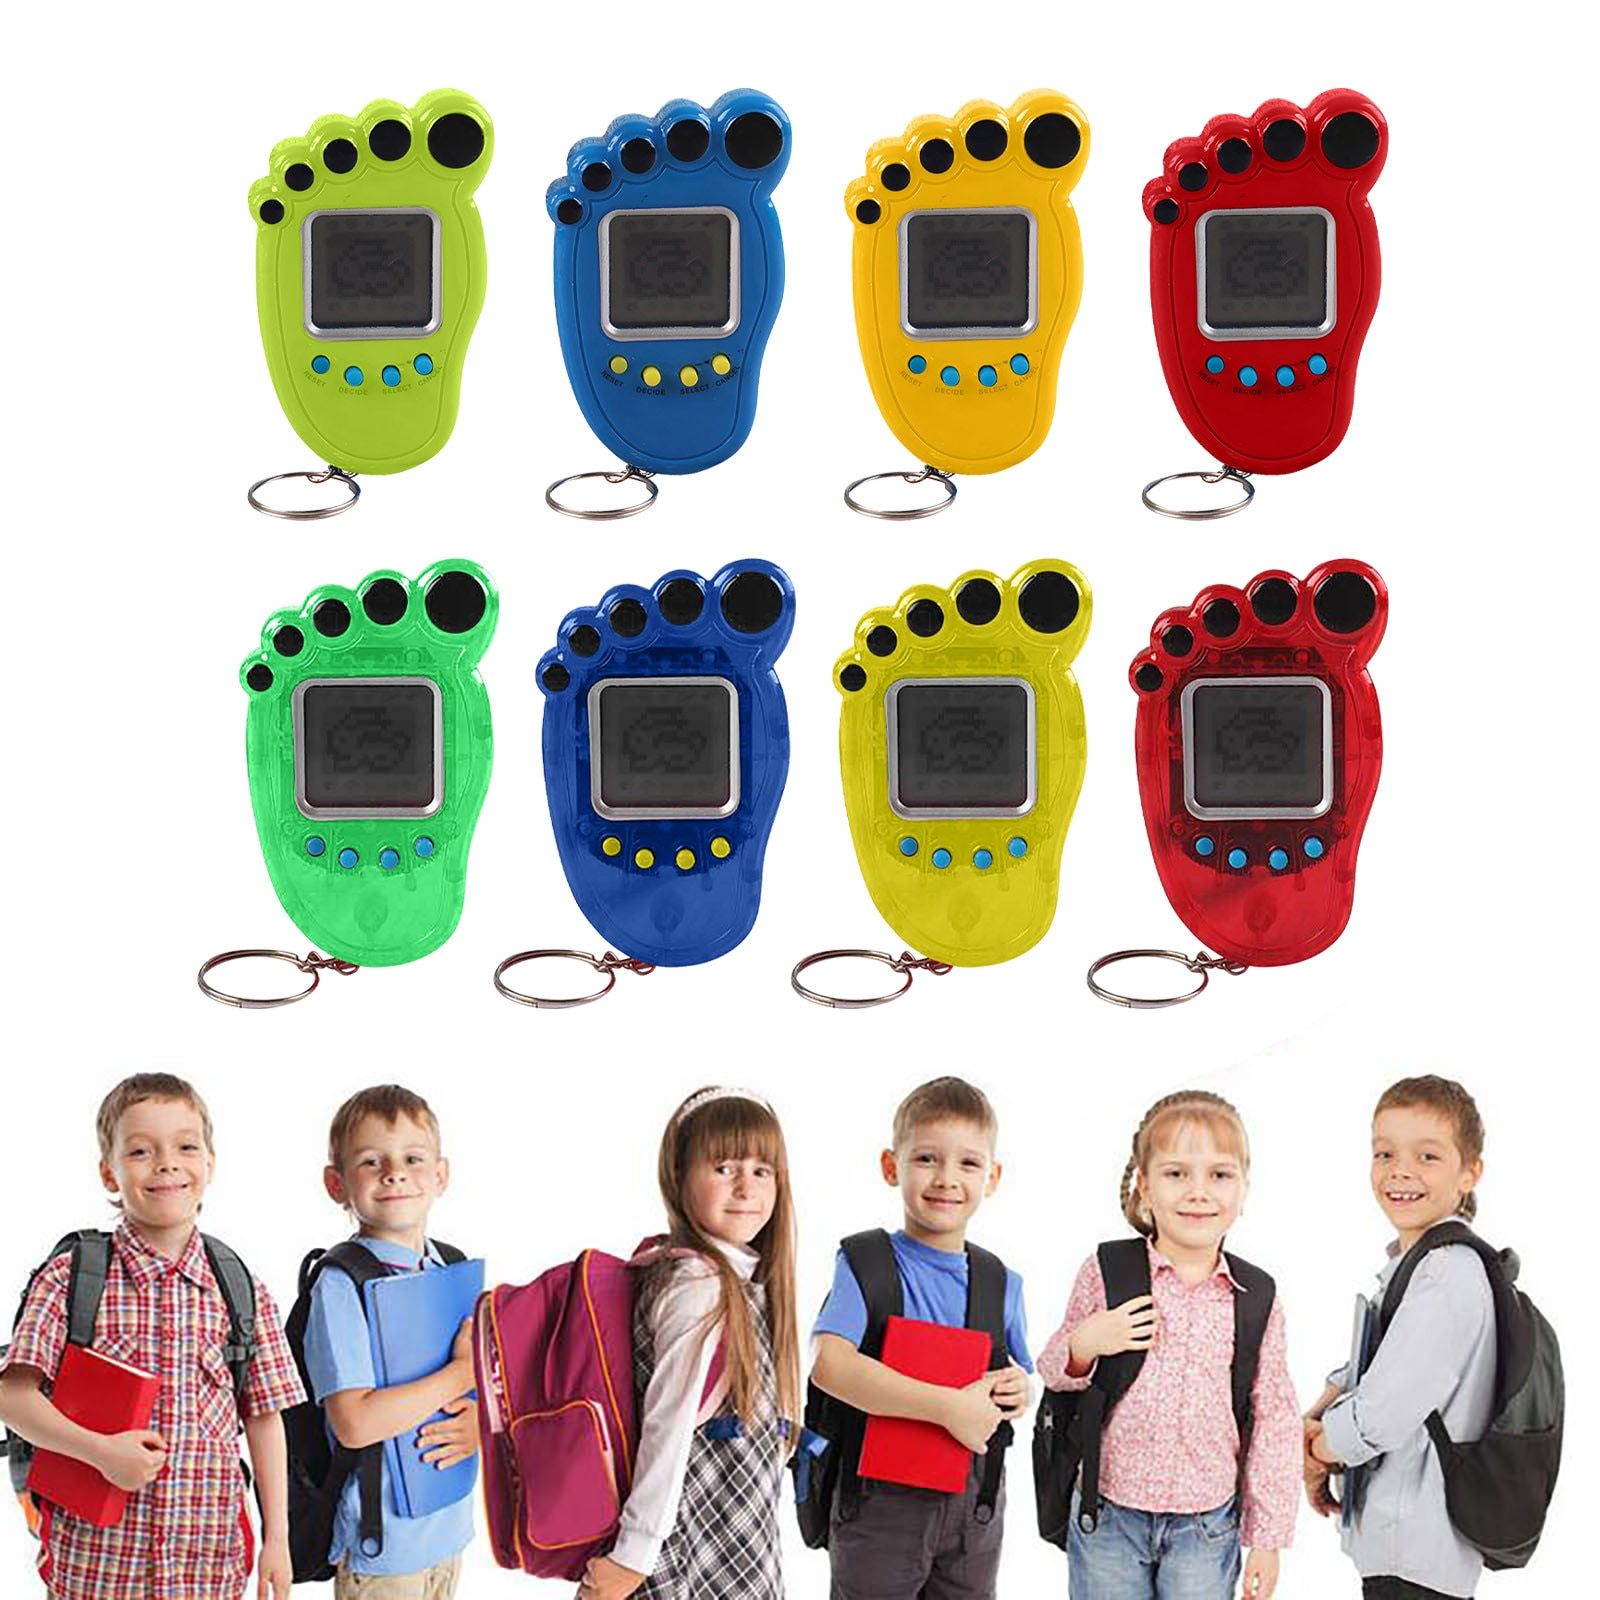 Portable Mini Electronic Virtual Pet Machine Keychain Virtual Pet Keychain Retro Handheld Game Machi